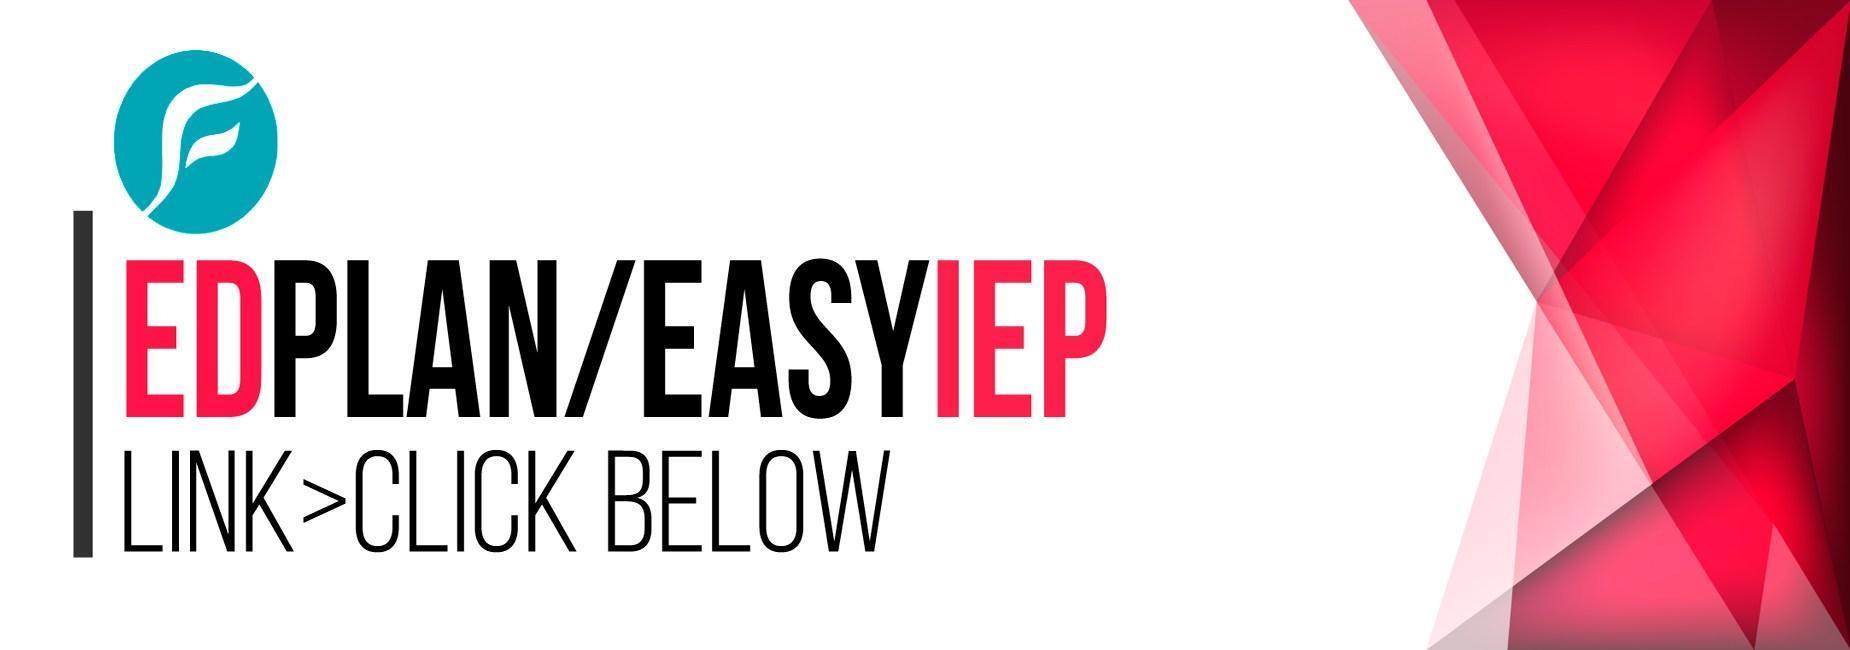 EASY IEP Banner